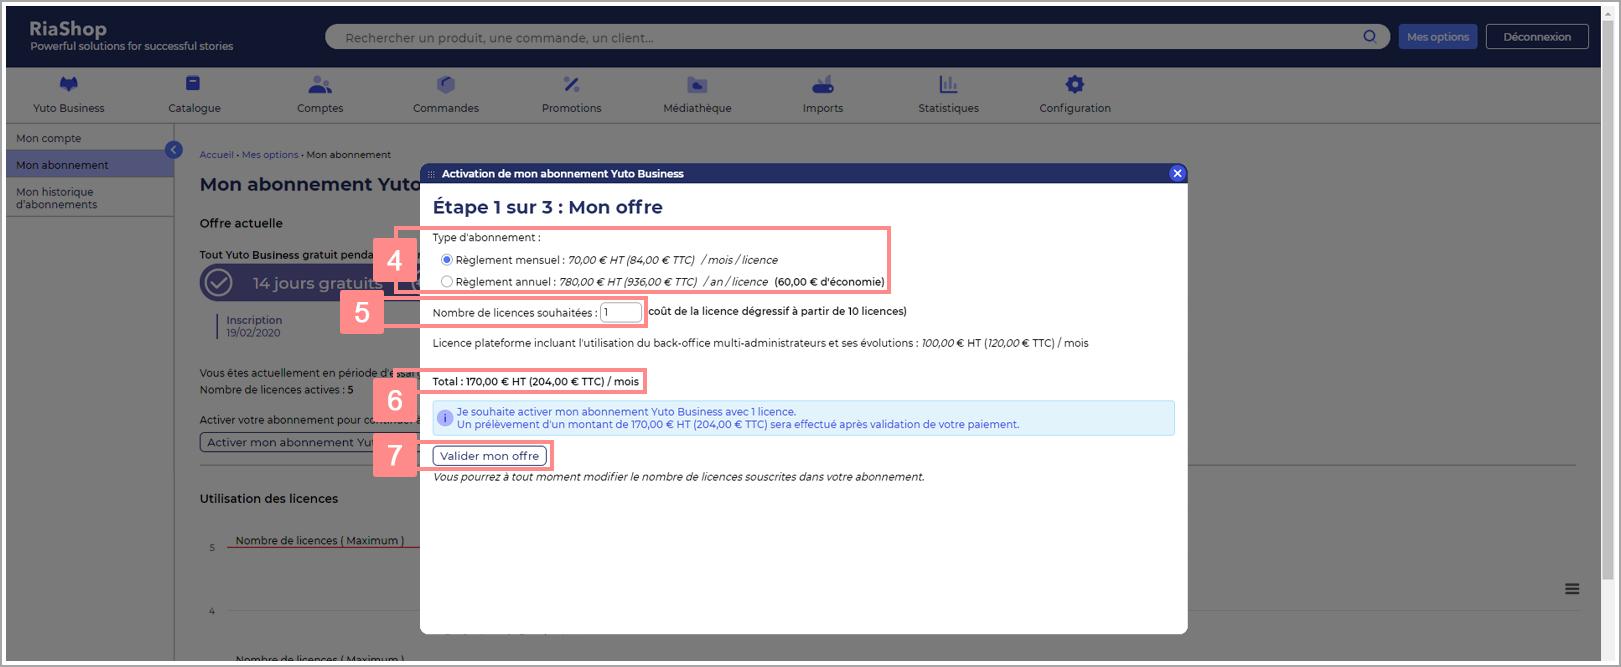 Configurer son offre Yuto - Site d'aide RiaShop / Yuto